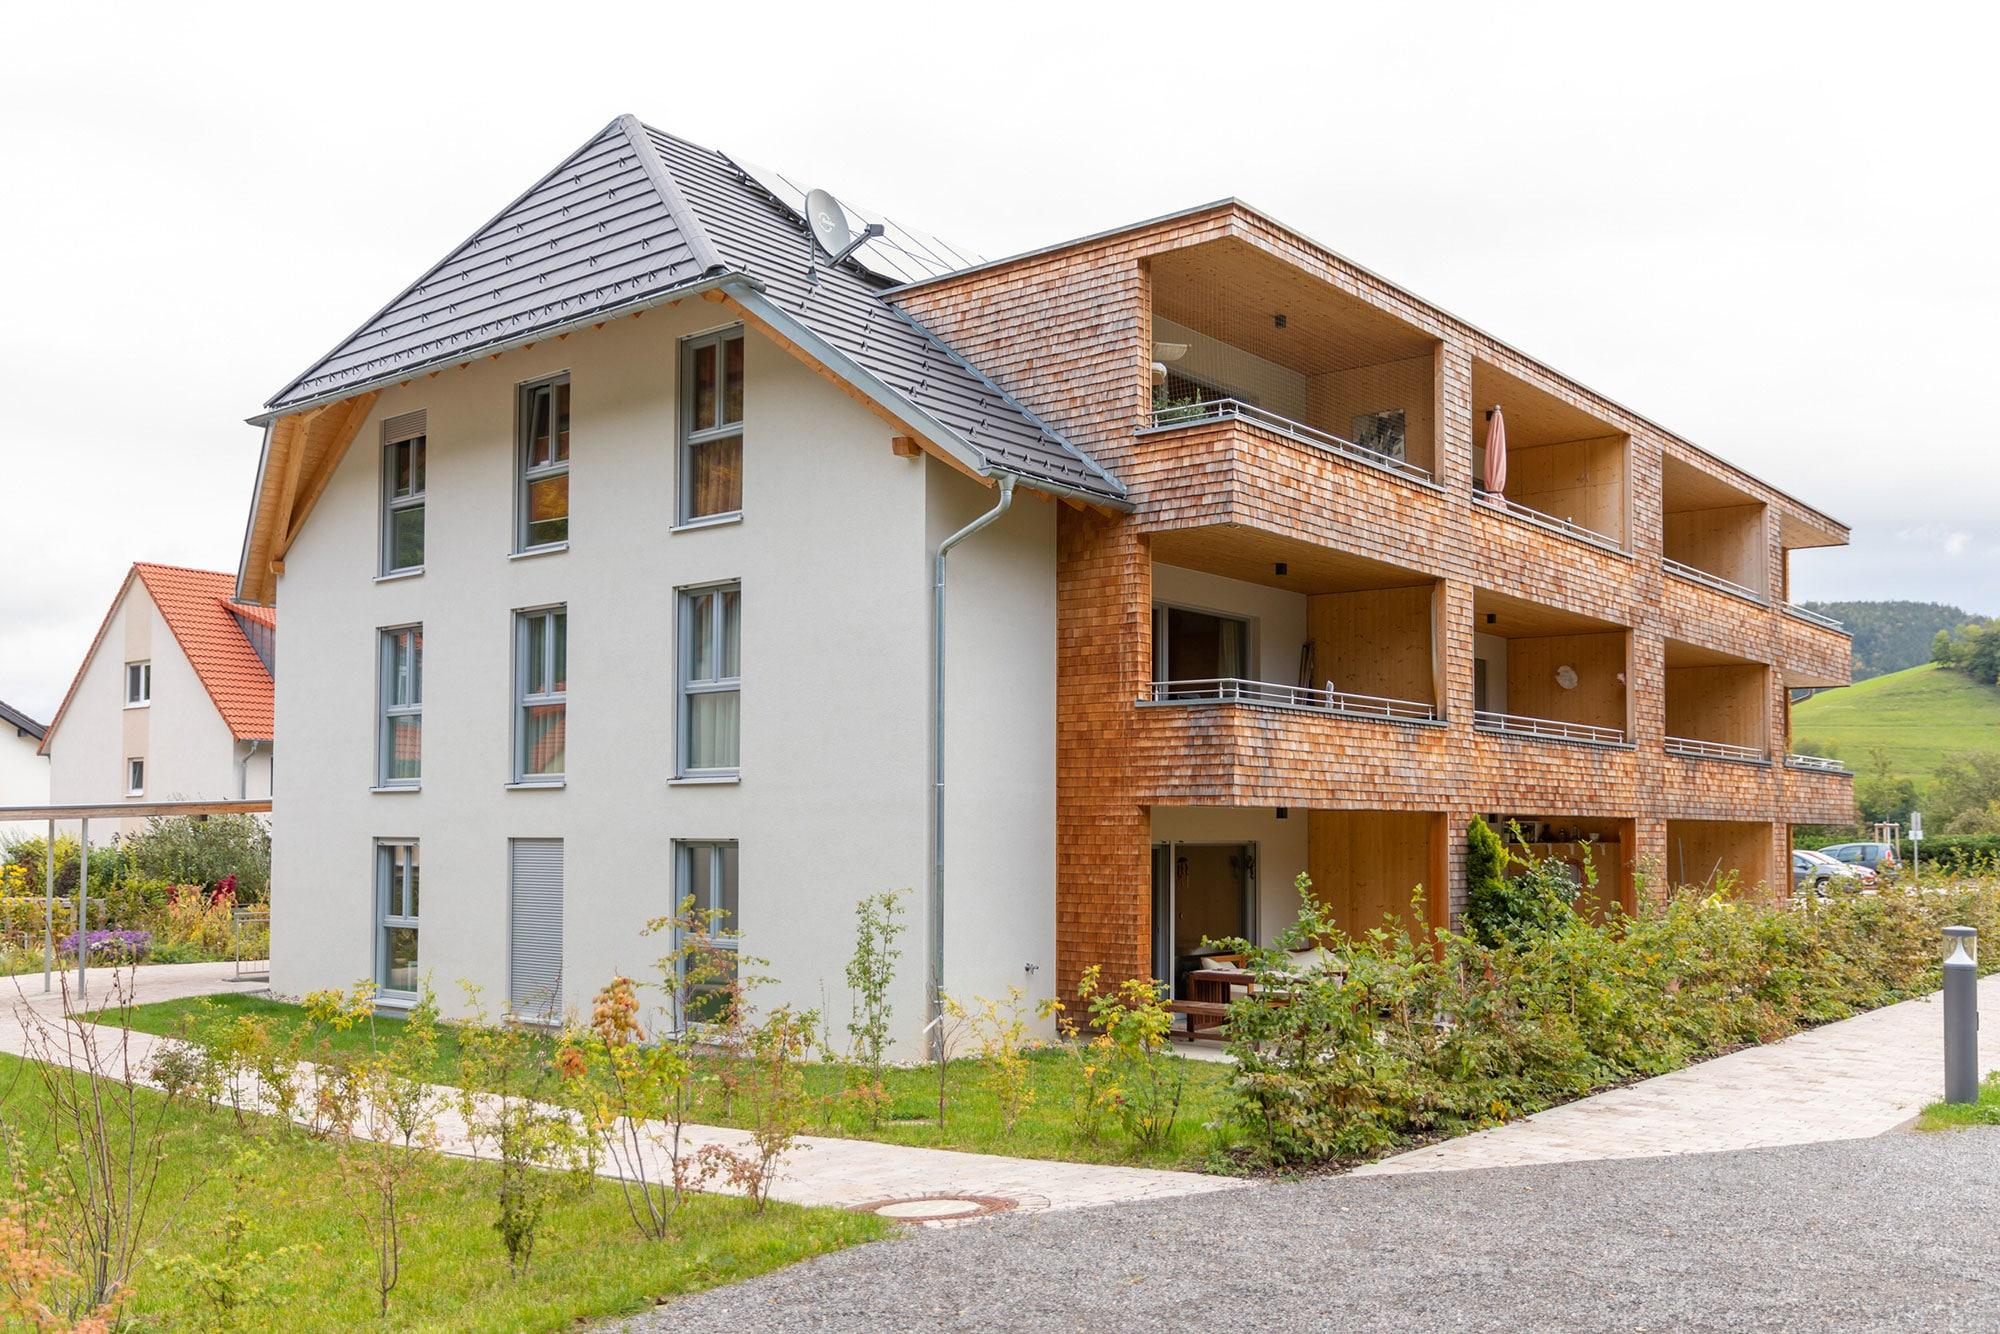 Mehrfamilienhaus aus Holz